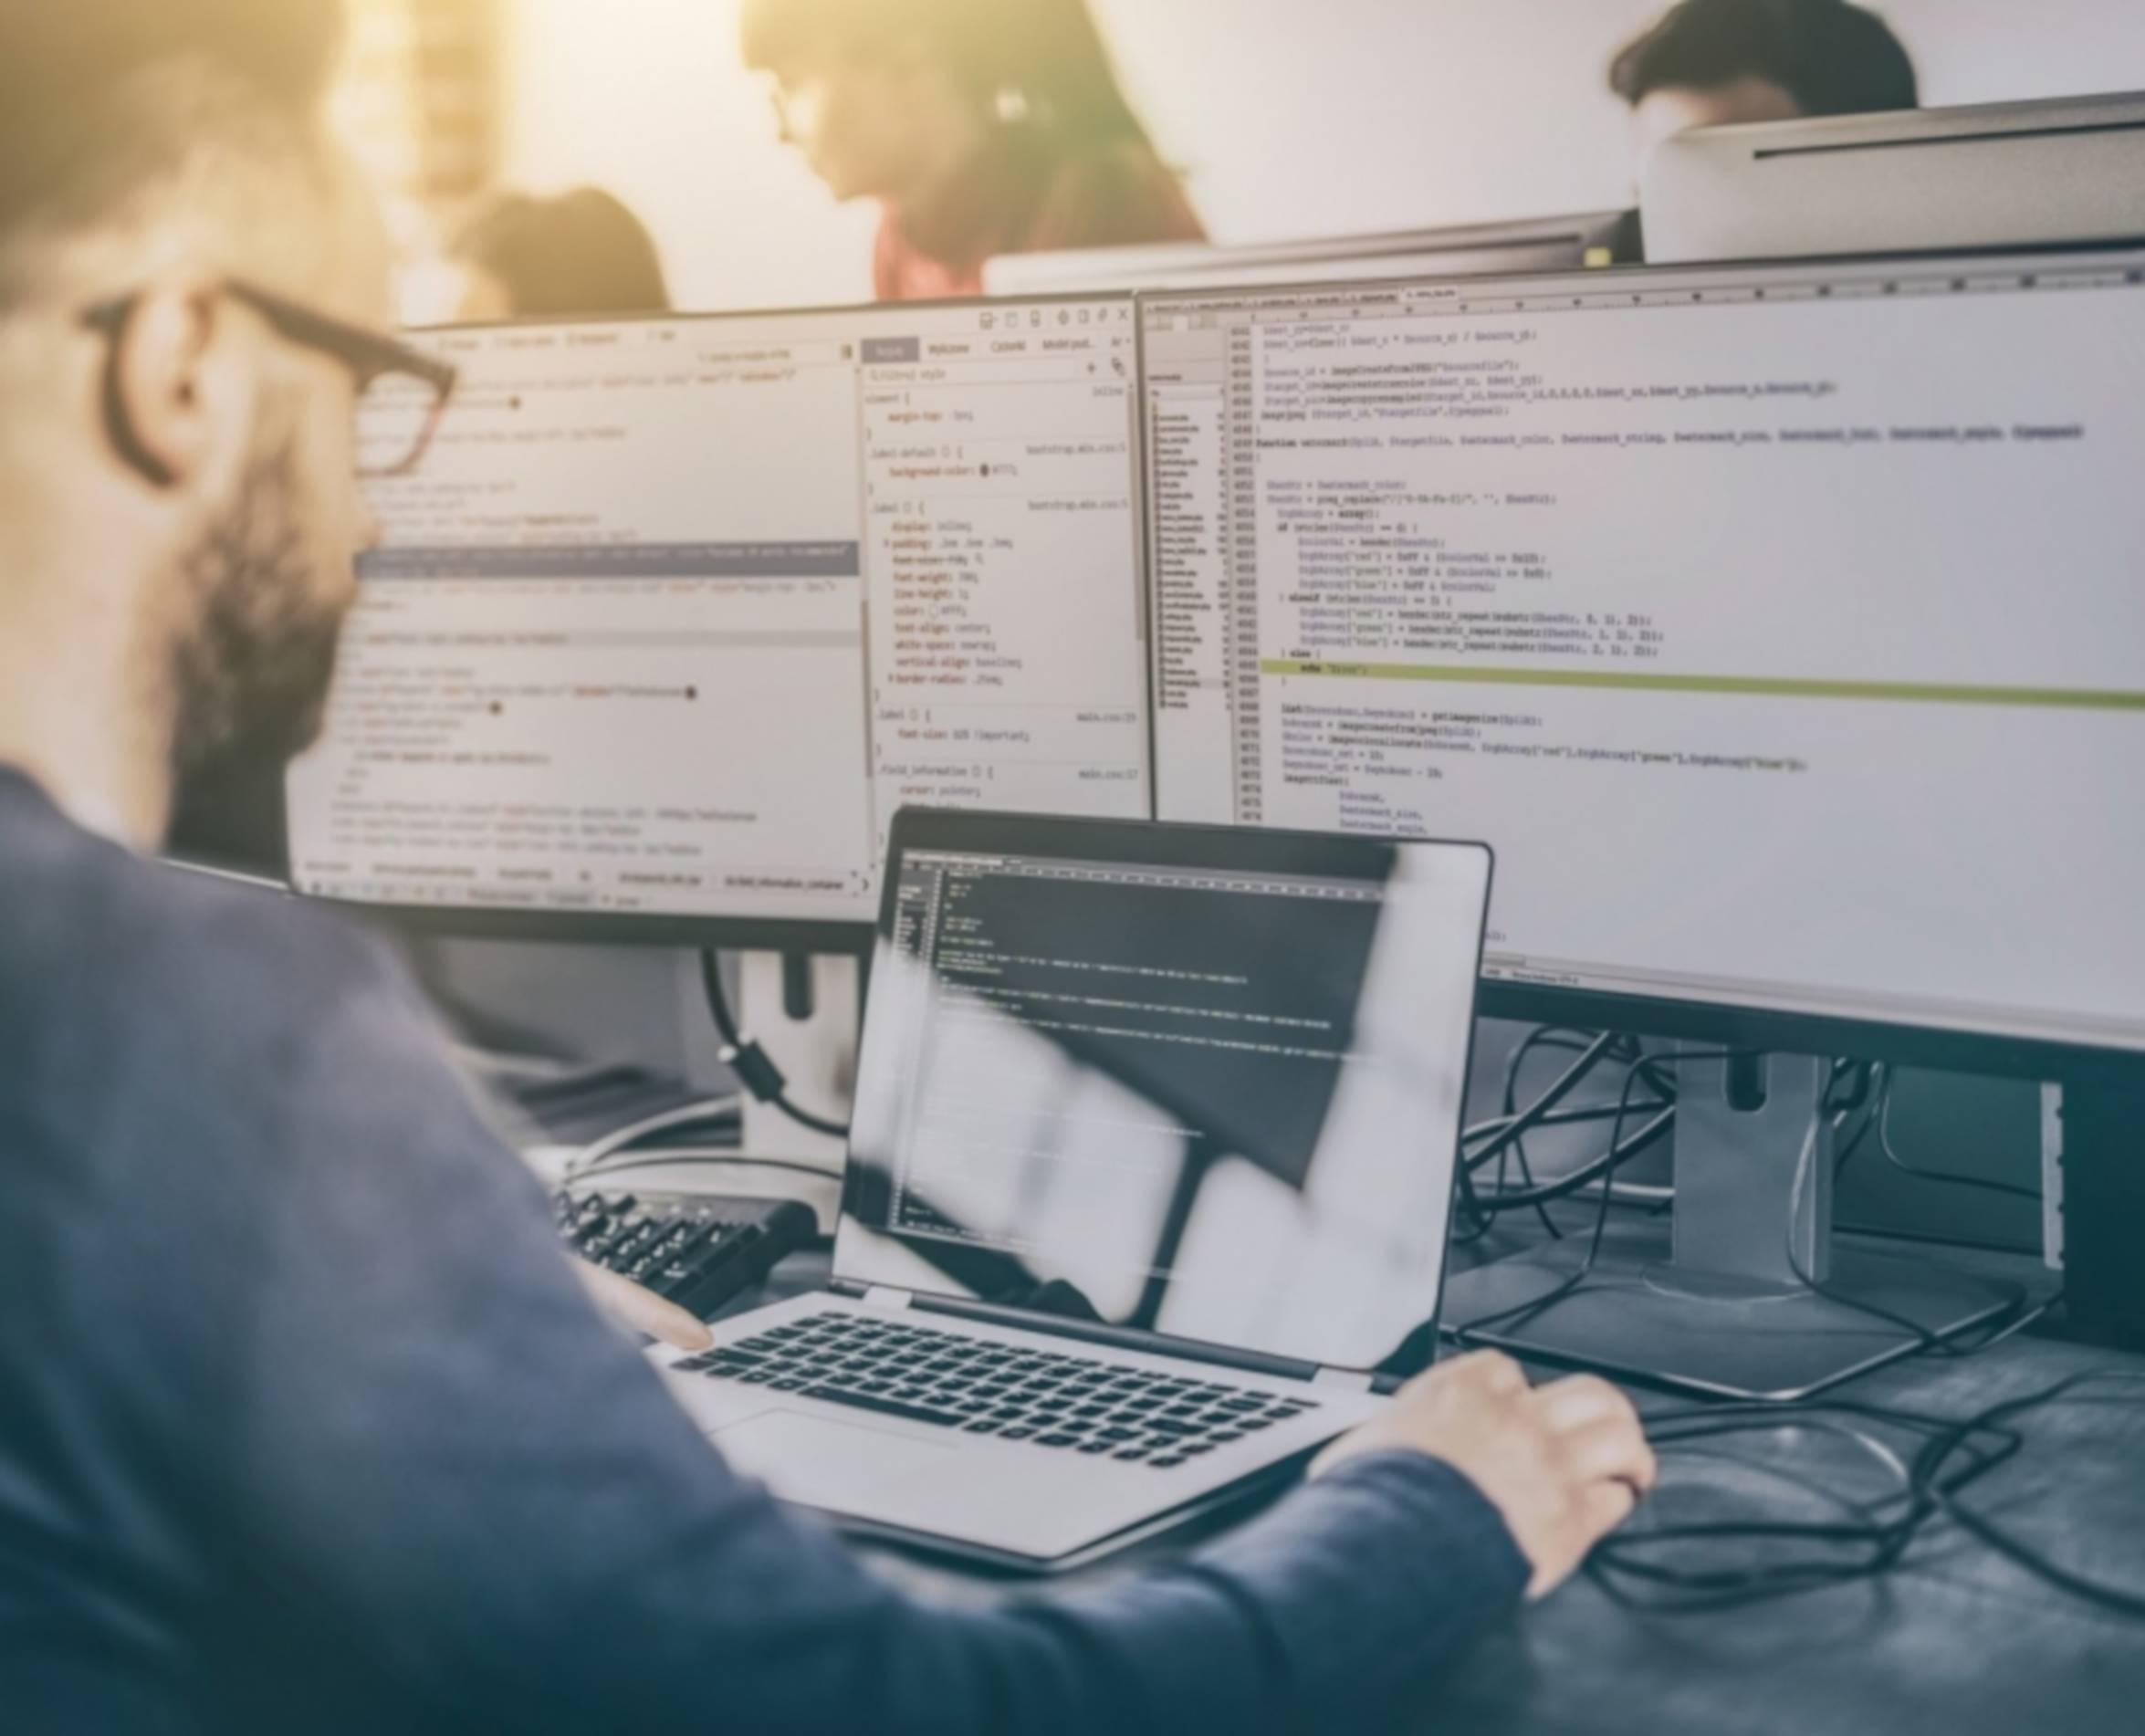 Virtline - Outsourcing IT, bezpieczeństwo IT